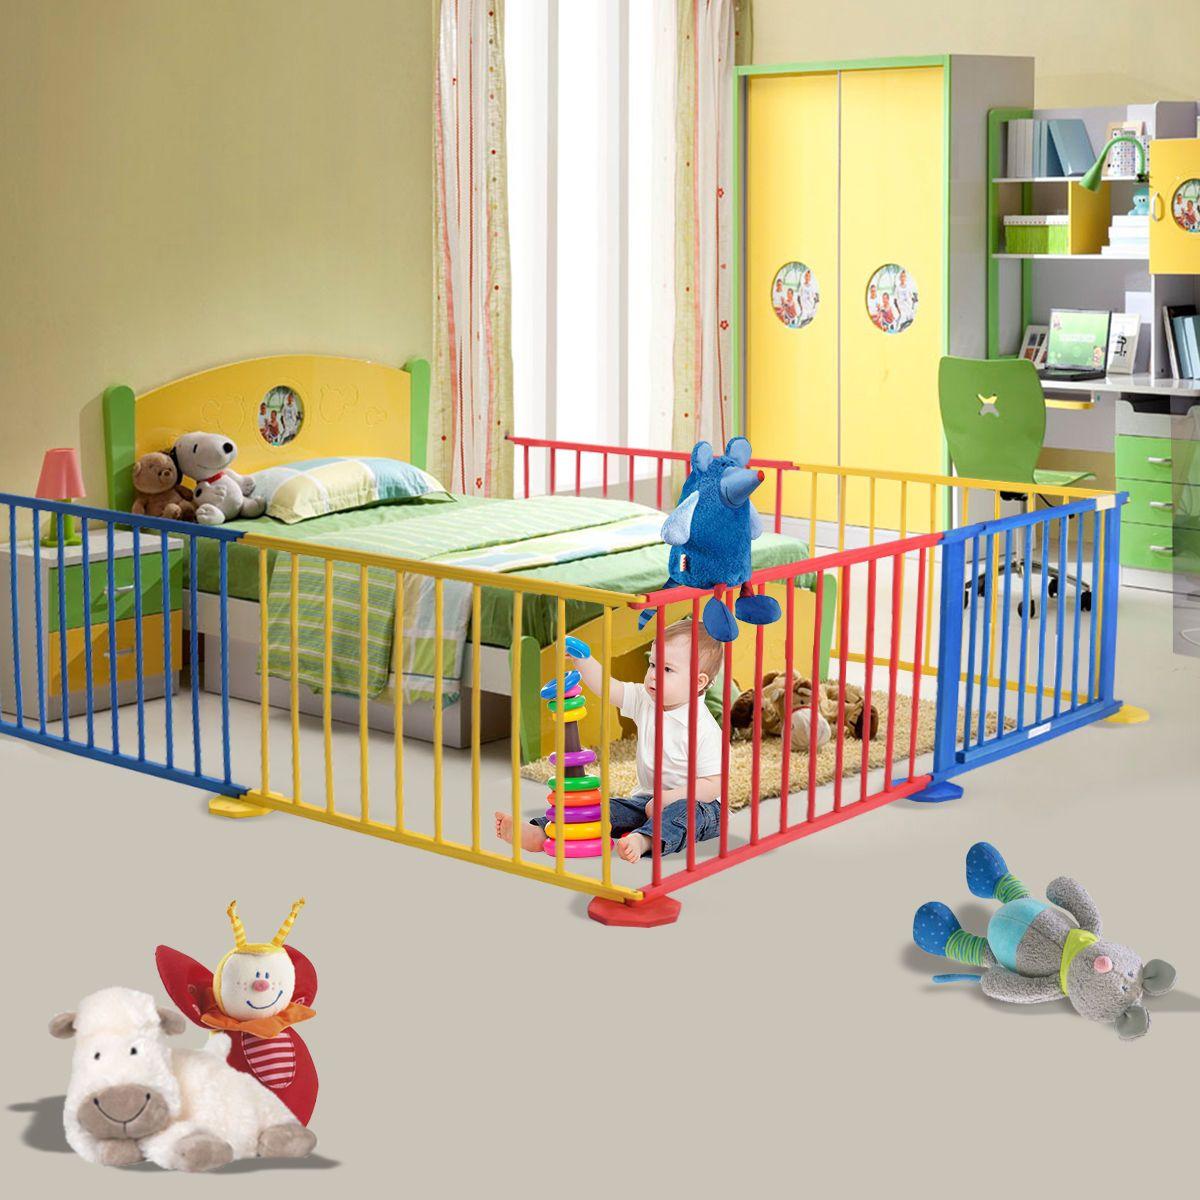 Baby Playpen 6 Panel Colors Wooden Frame Children Playard